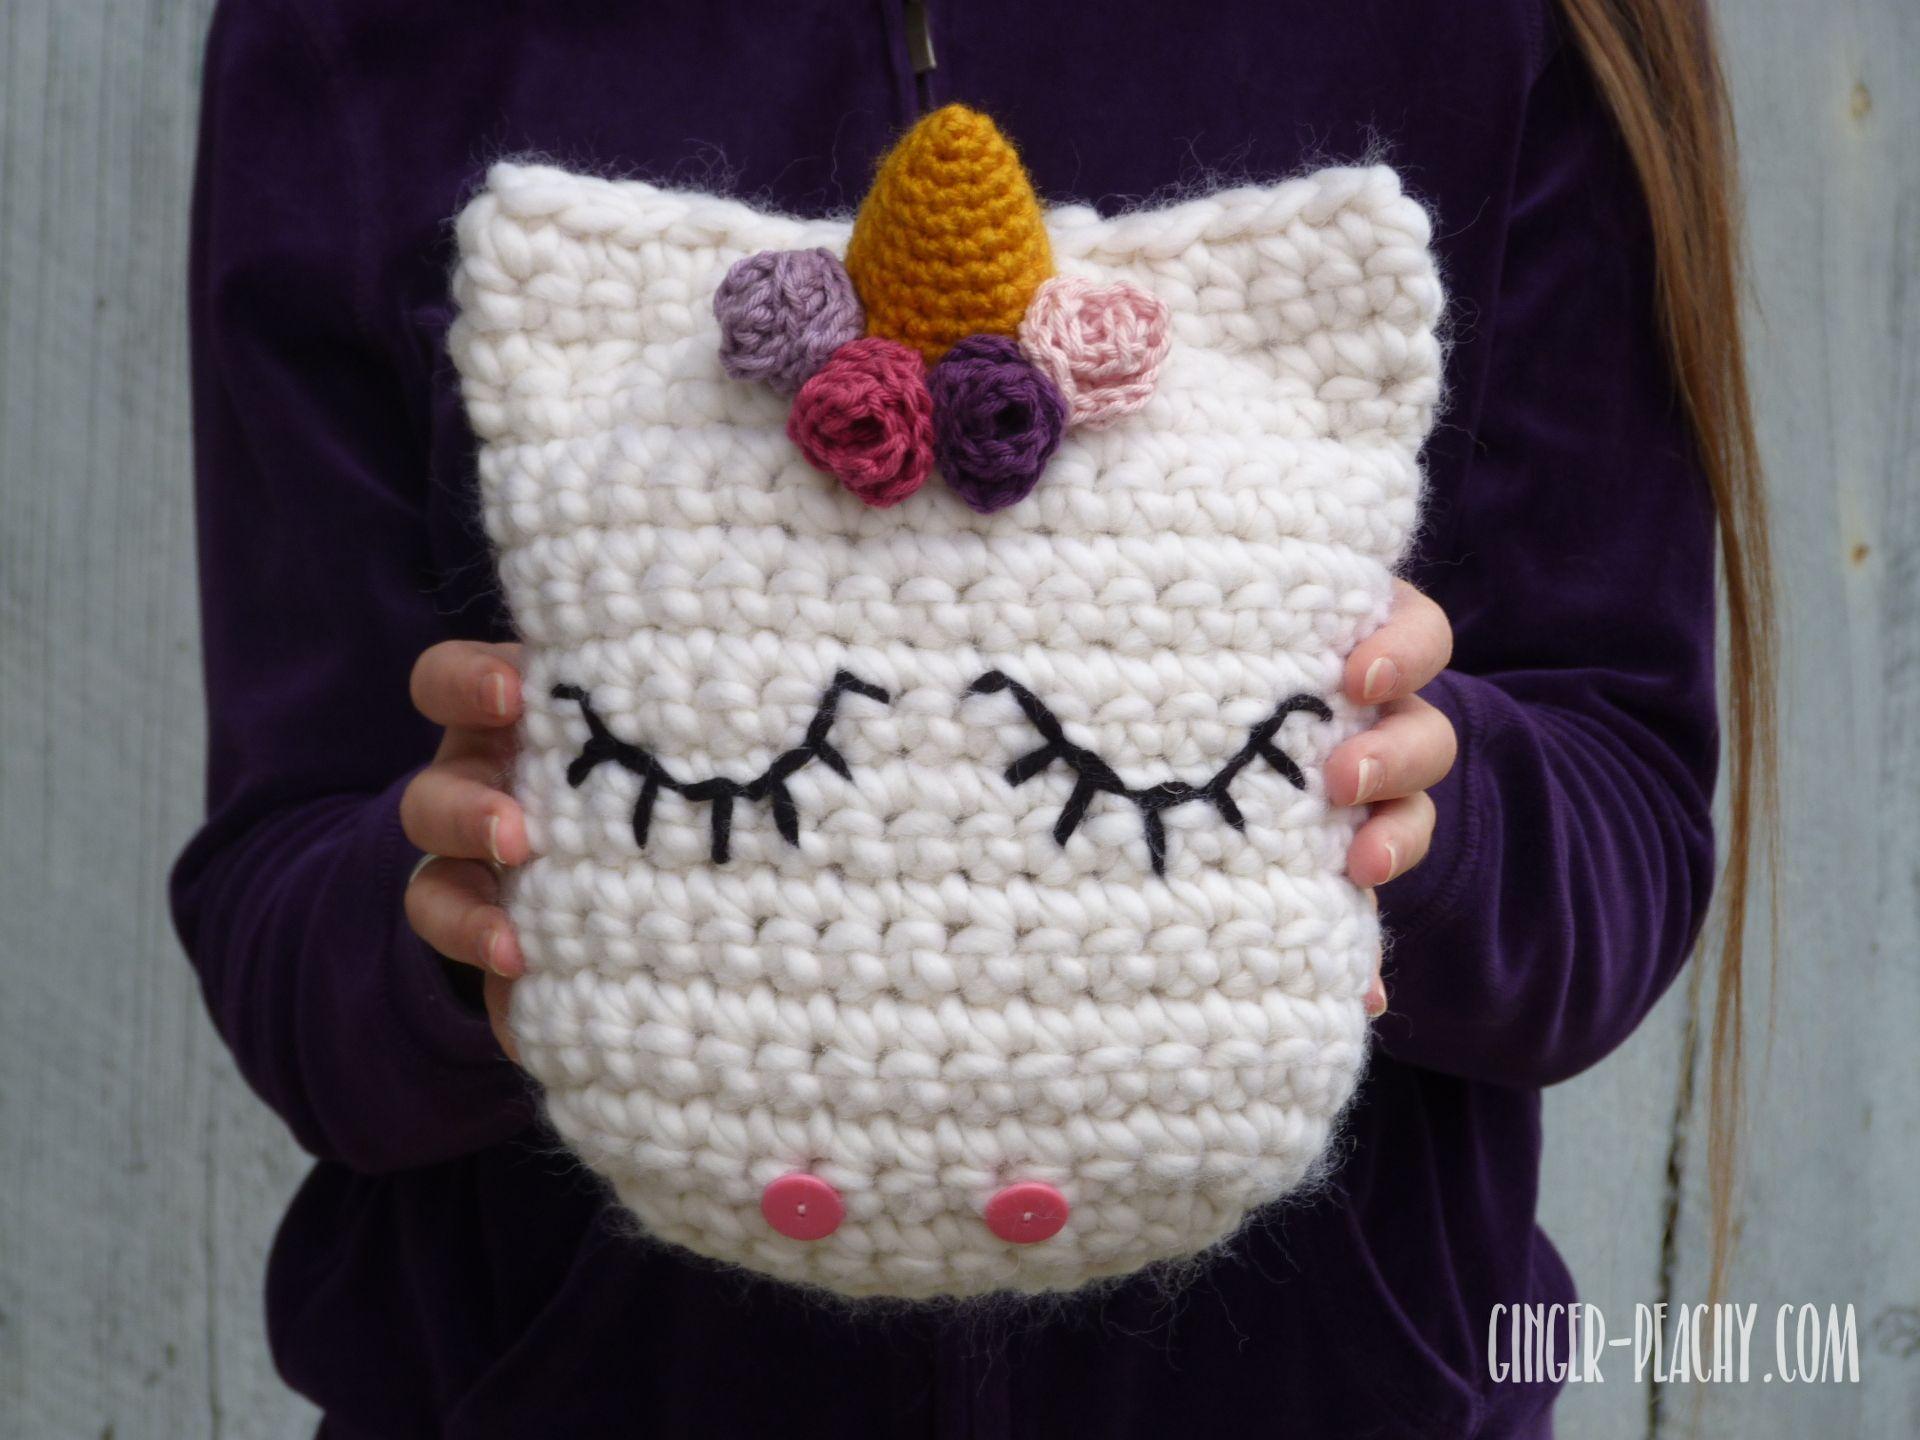 Udora unicorn pillow free crochet pattern at ginger peachy